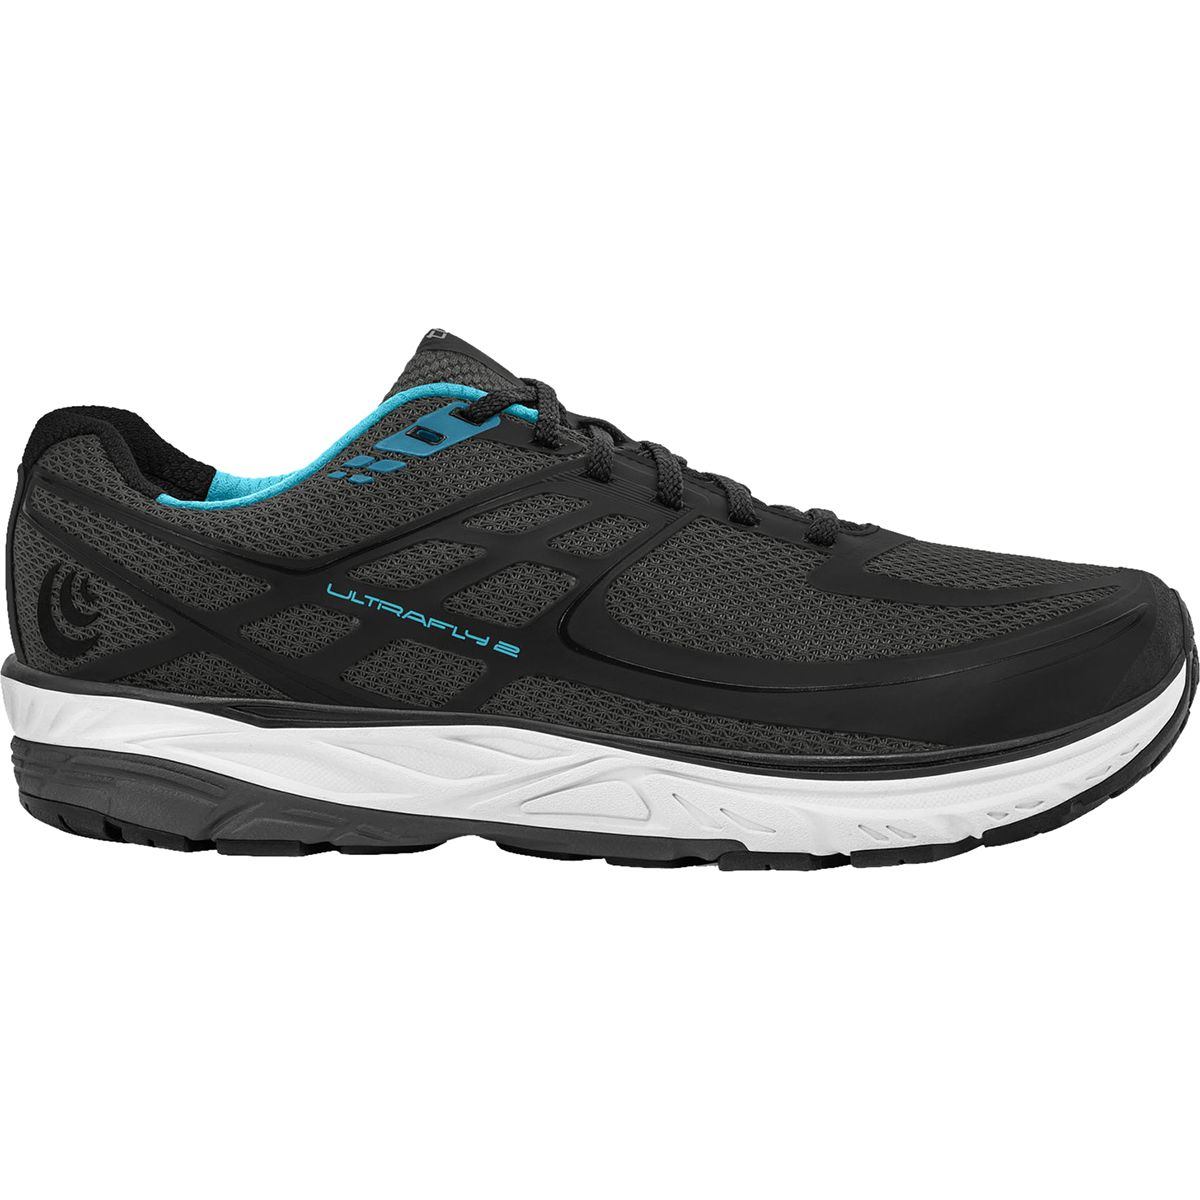 Topo Athletic Ultrafly 2 Running Shoe - Women's Black/Blue, 10.0 TPA000Z-BLA-S10